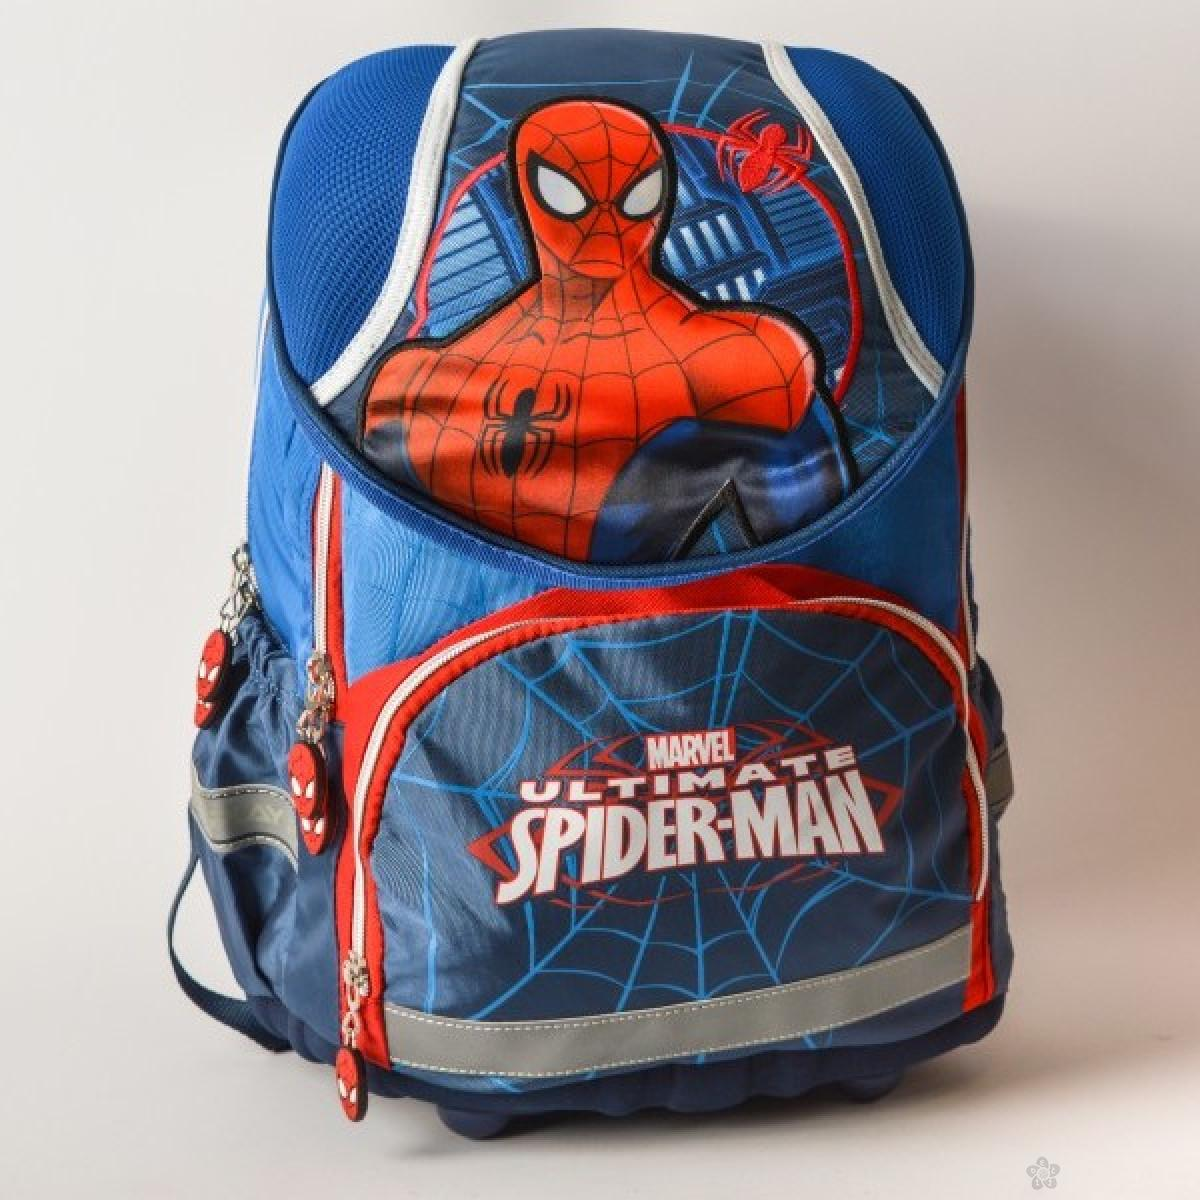 Anatomski ranac Spiderman, plavi